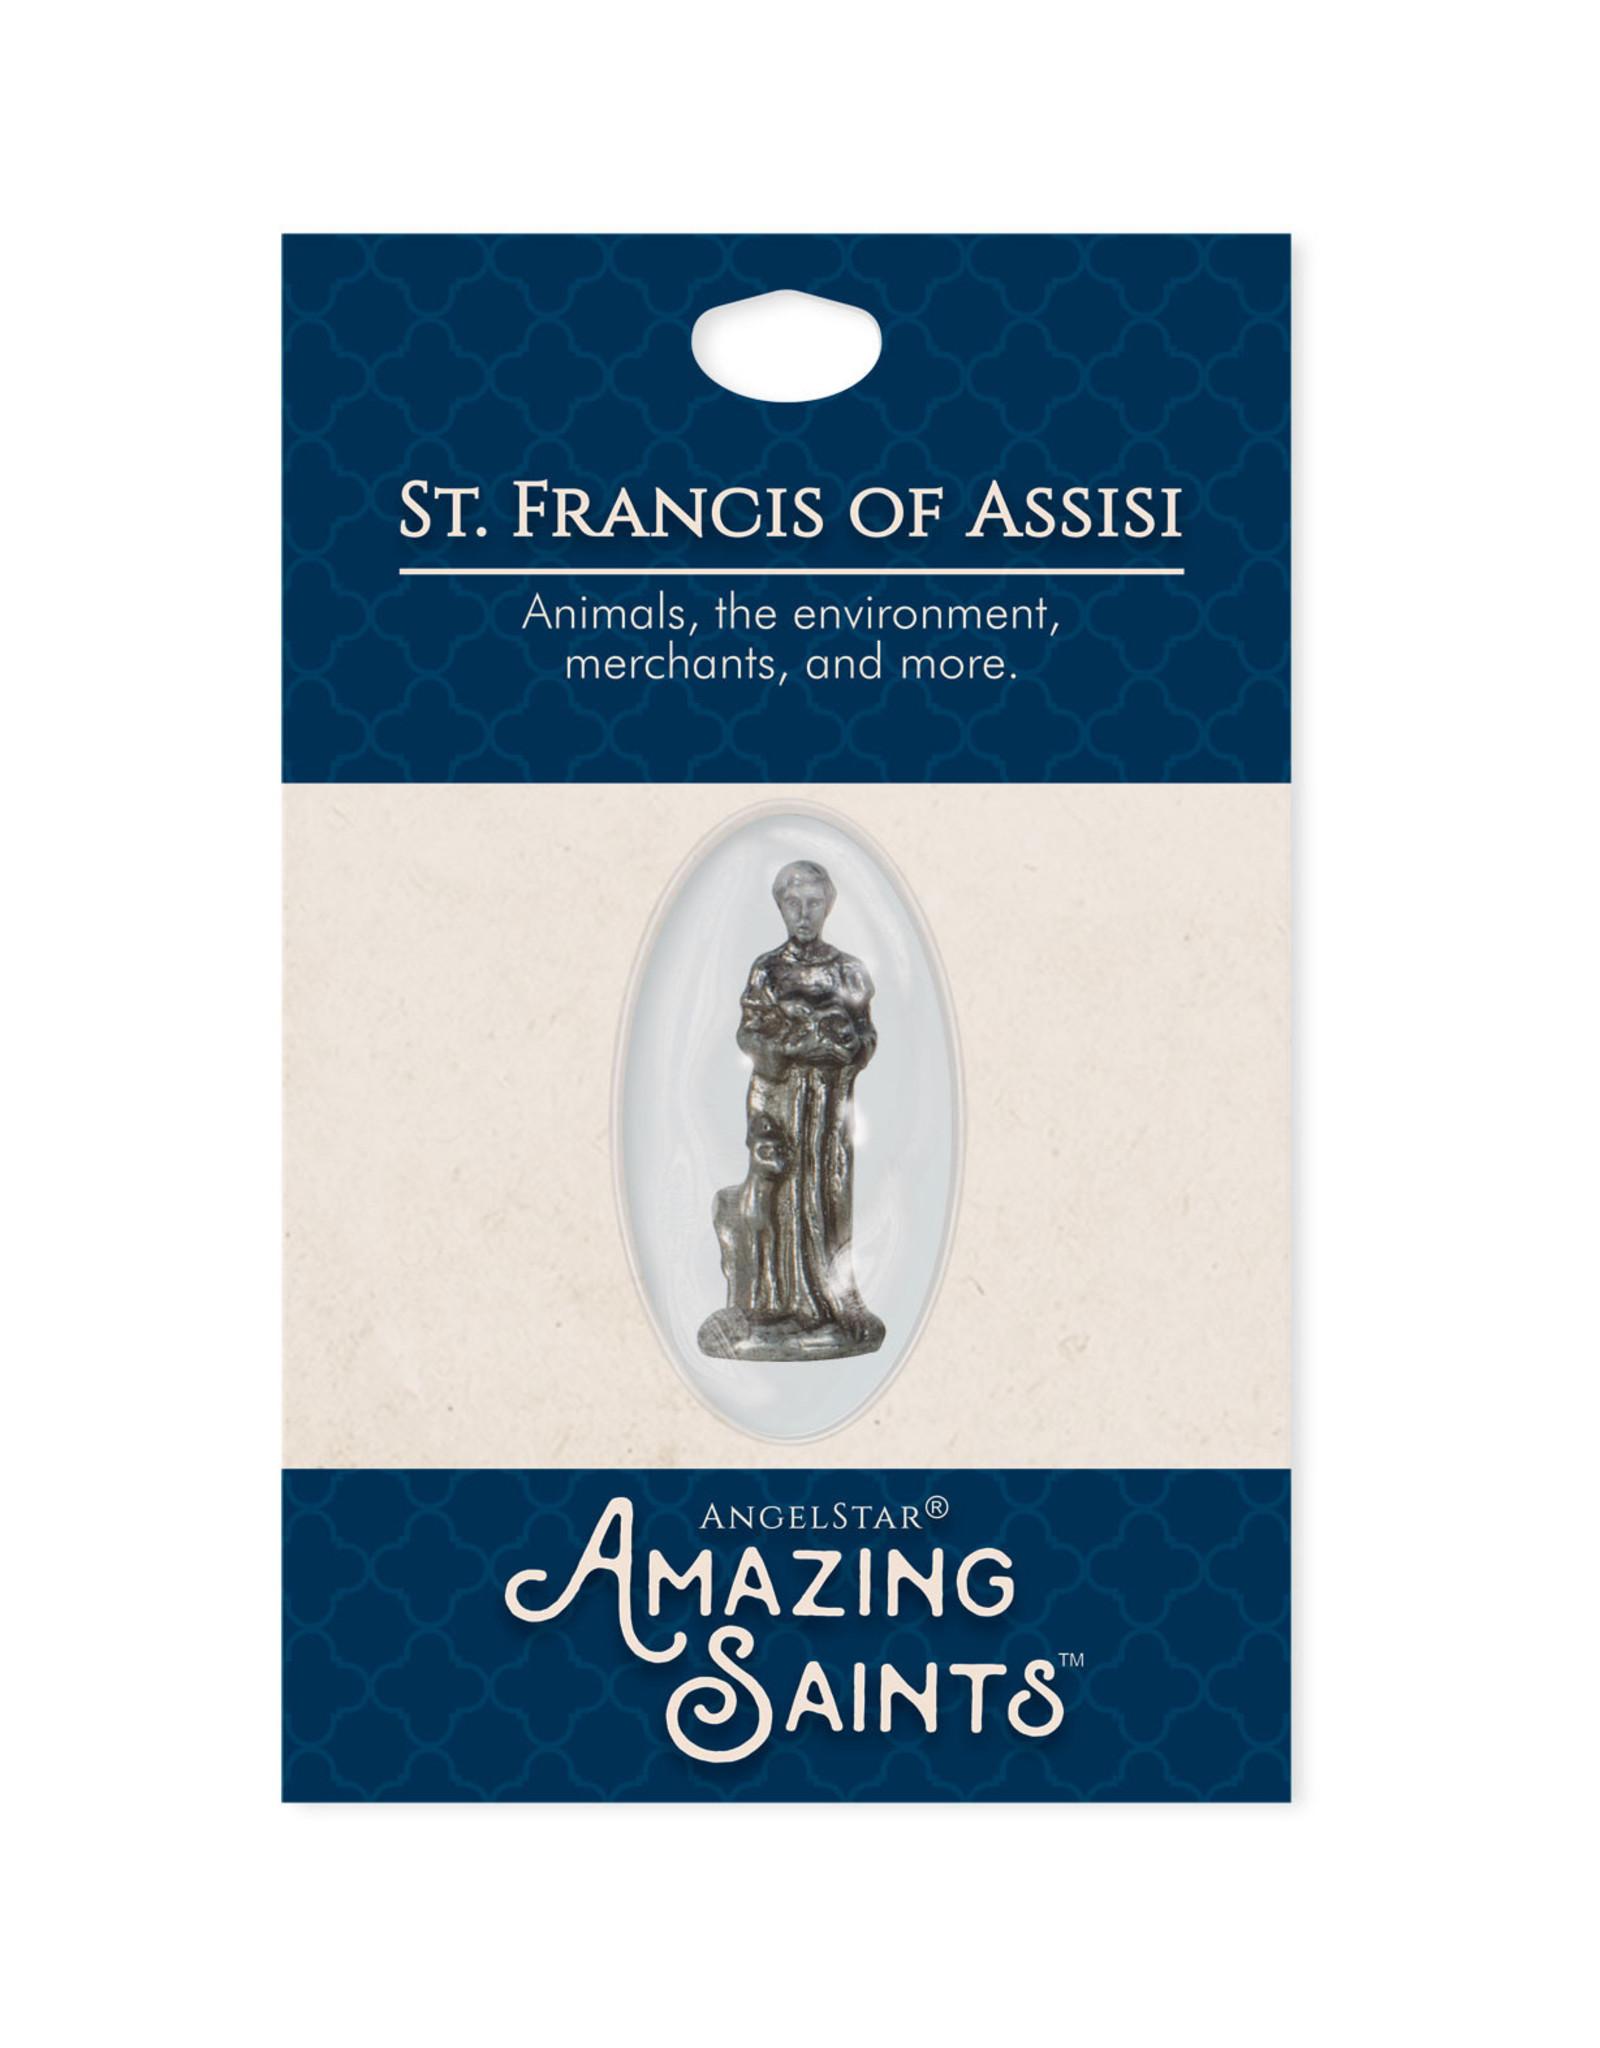 Amazing Saints - St. Francis of Assisi